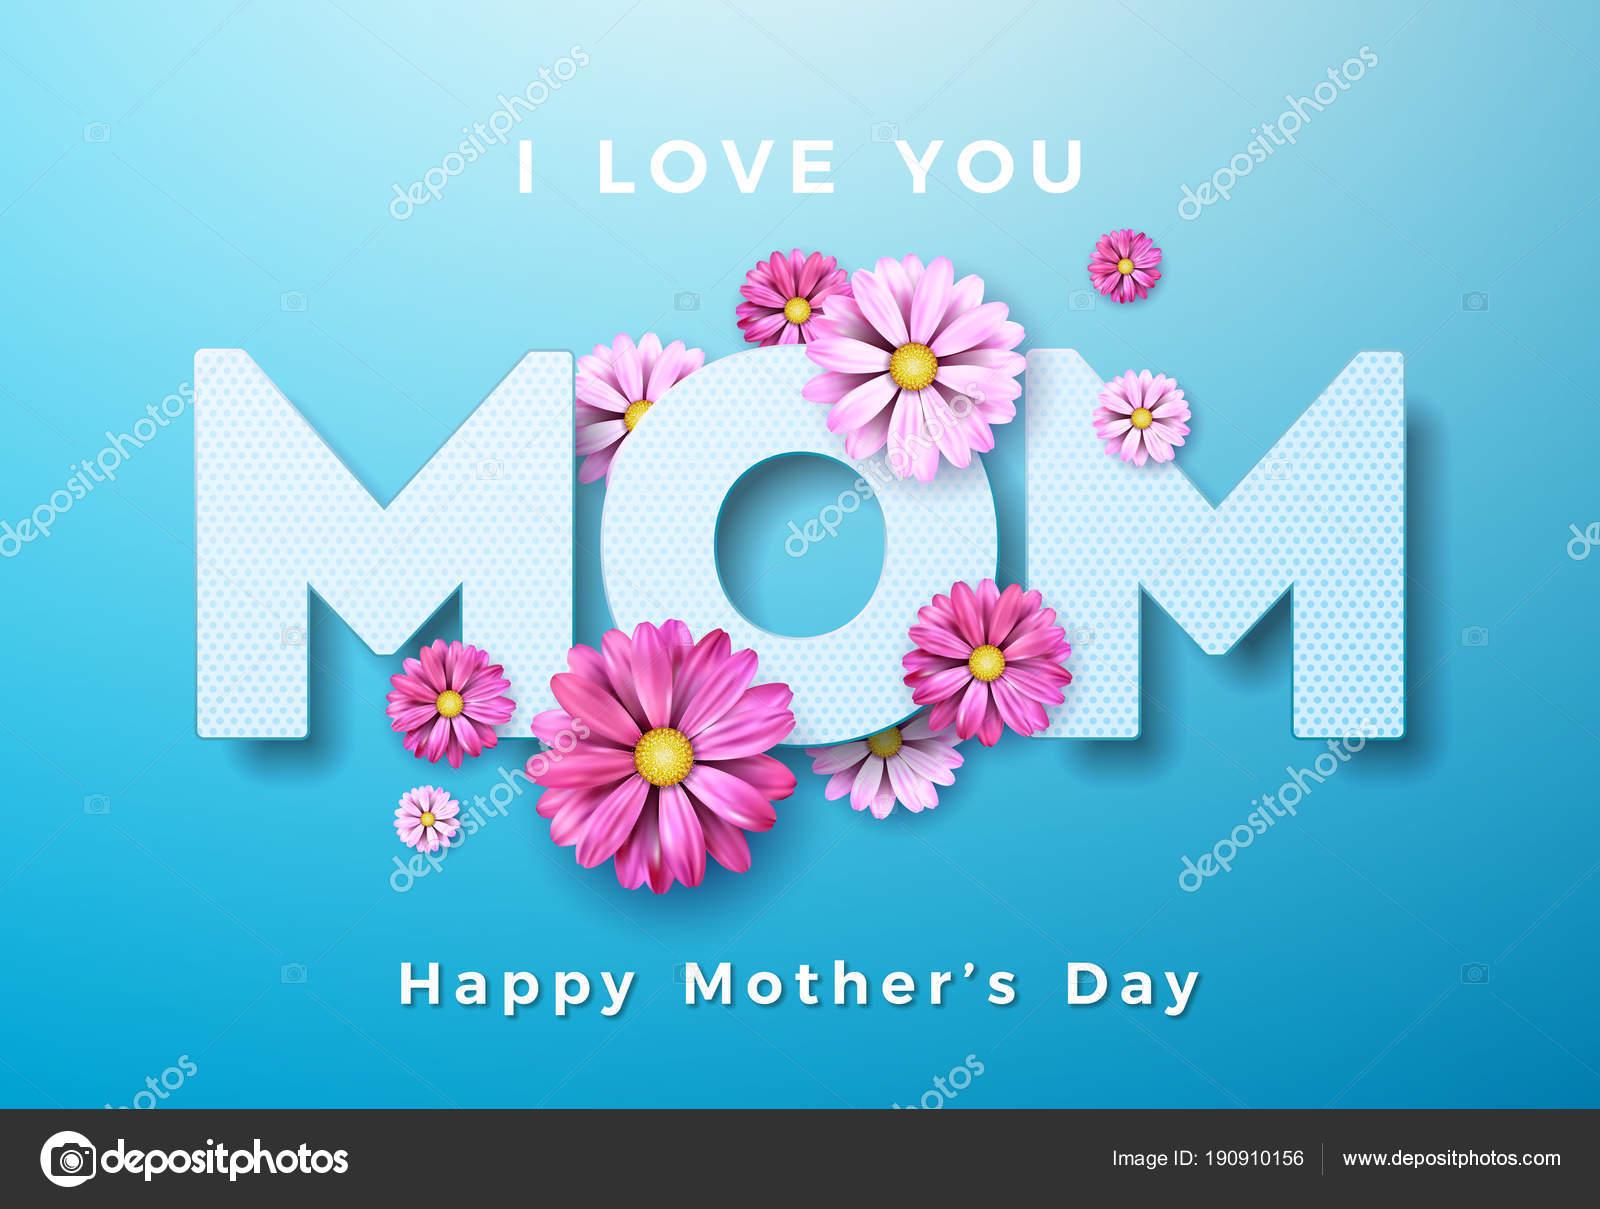 Happy mothers day wenskaart ontwerpelementen met bloem en i love u happy mothers day wenskaart ontwerpelementen met bloem en i love u mam typografische op blauwe achtergrond voltagebd Choice Image